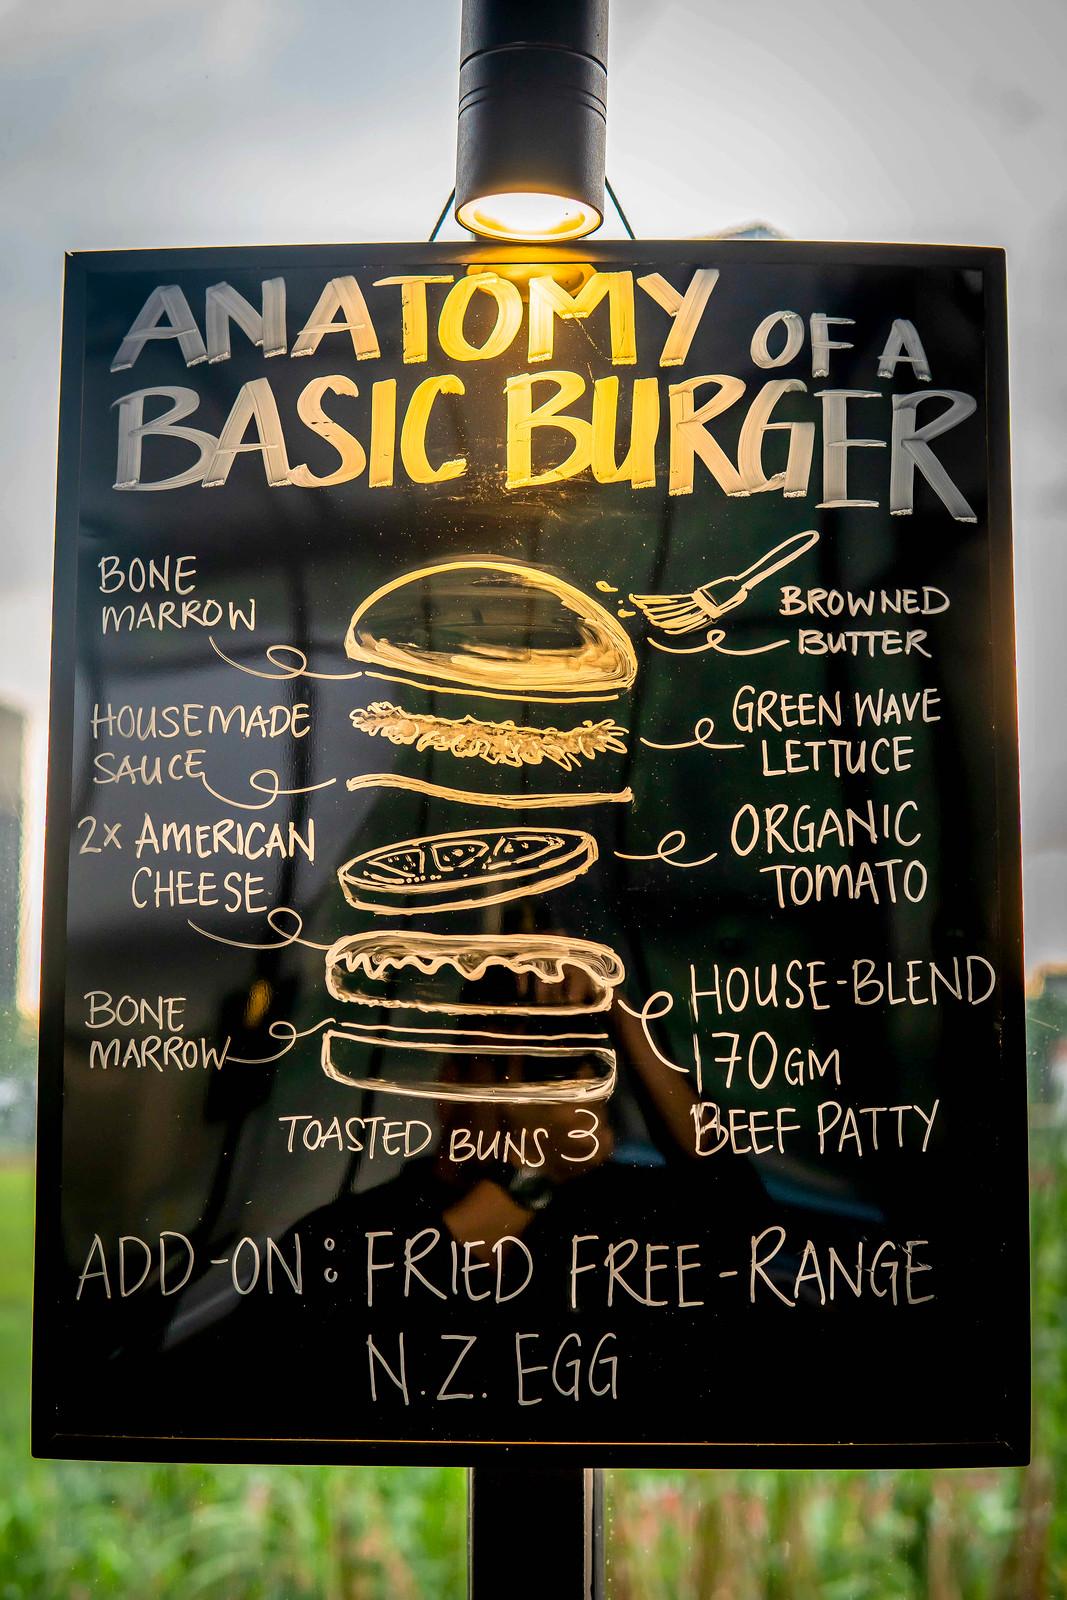 BurgerLaboAnatomy1